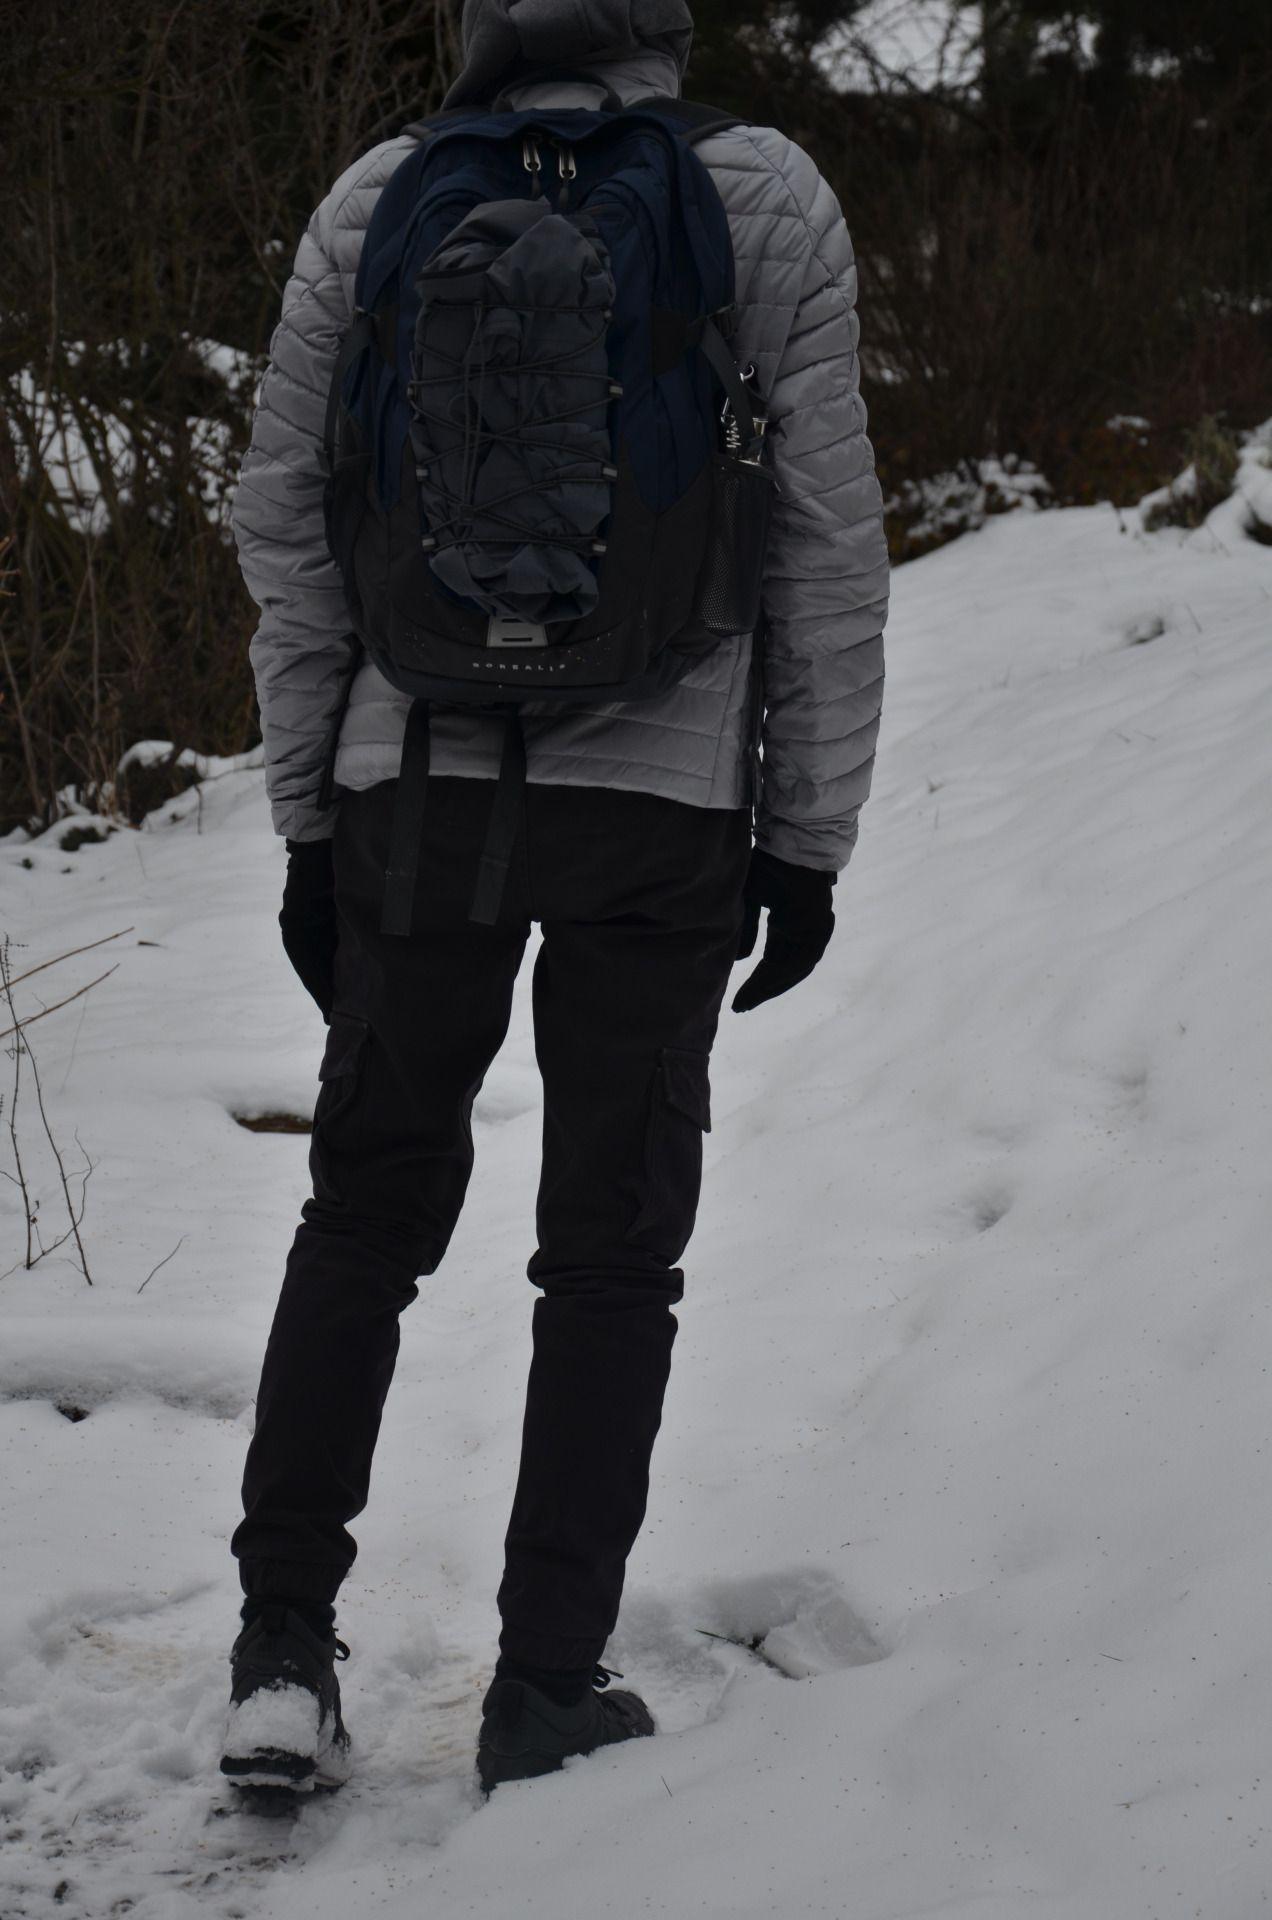 Snow Techwear Outfit | Techwear Inspo | Pinterest | Snow